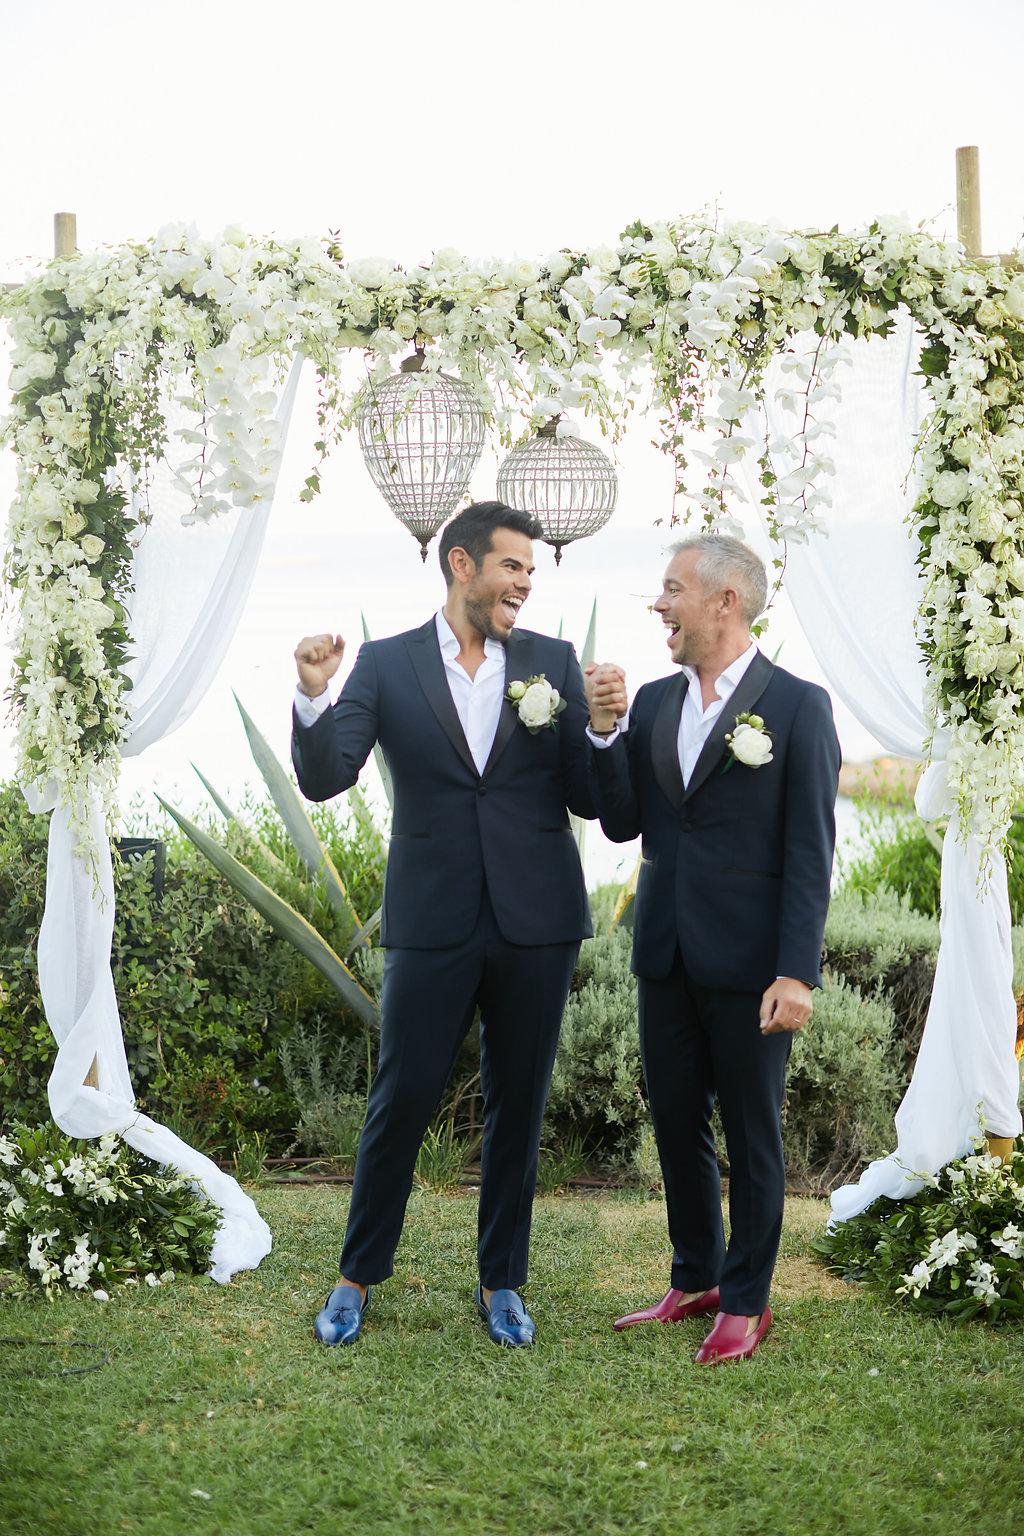 wedding ceremonies - photo by Sotiris Tsakanikas https://ruffledblog.com/chic-sunset-wedding-on-the-athens-riviera